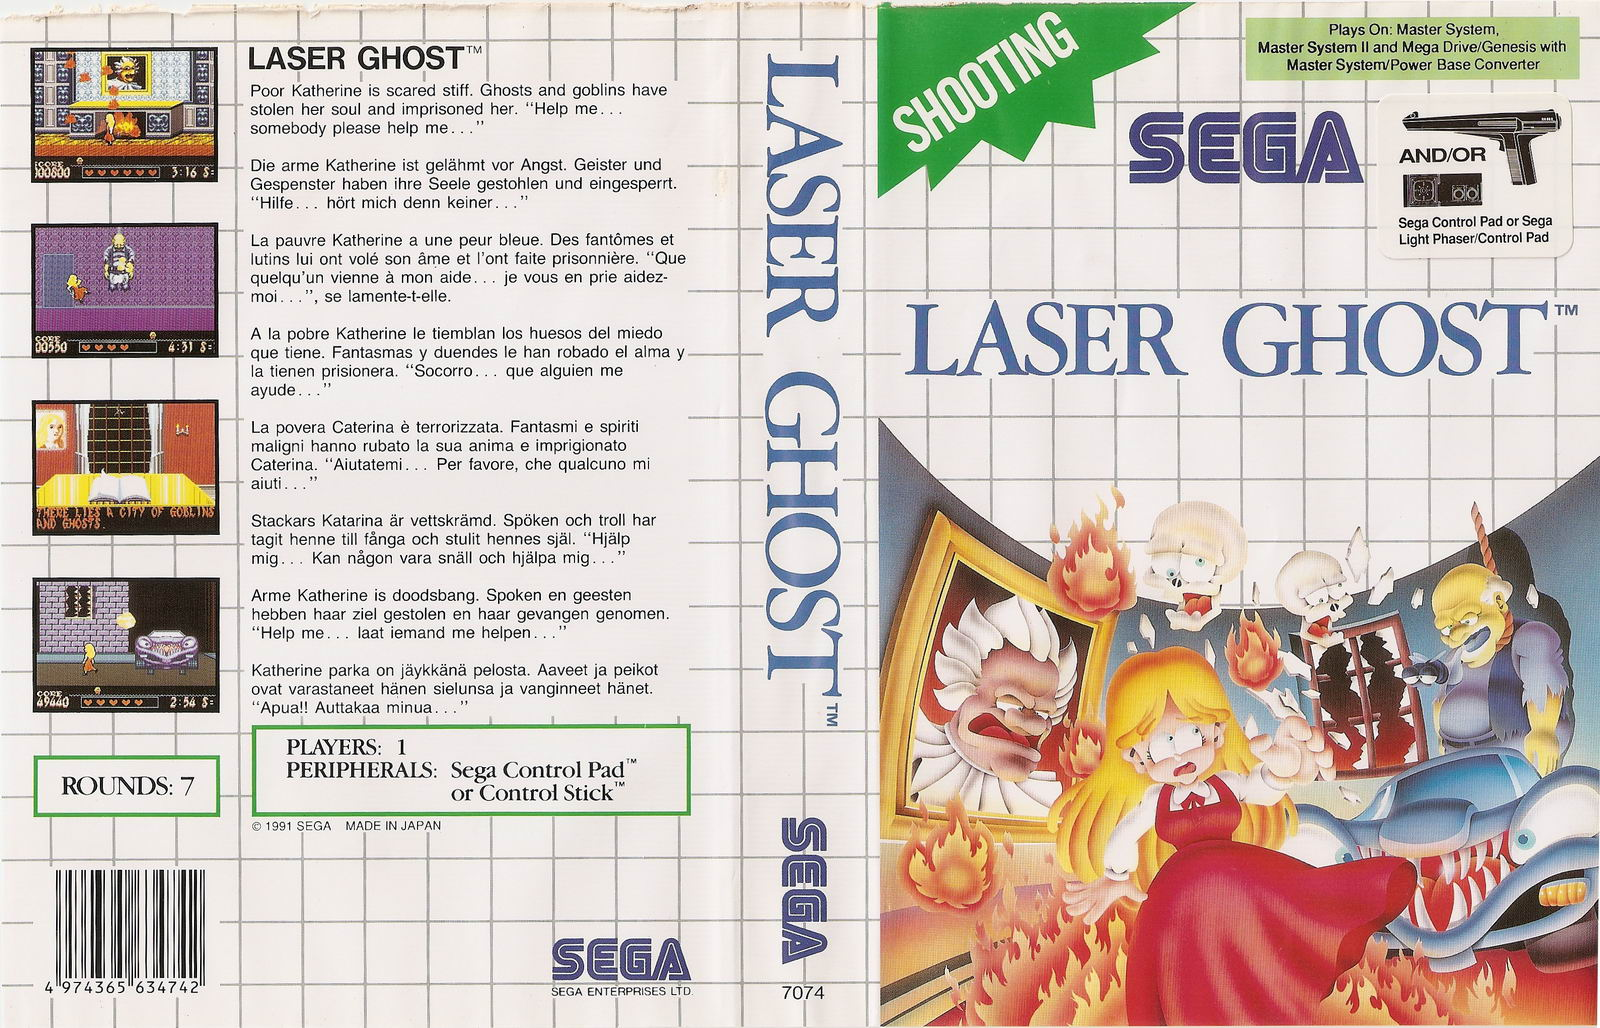 http://www.smspower.org/uploads/Scans/LaserGhost-SMS-EU-Sticker.jpg